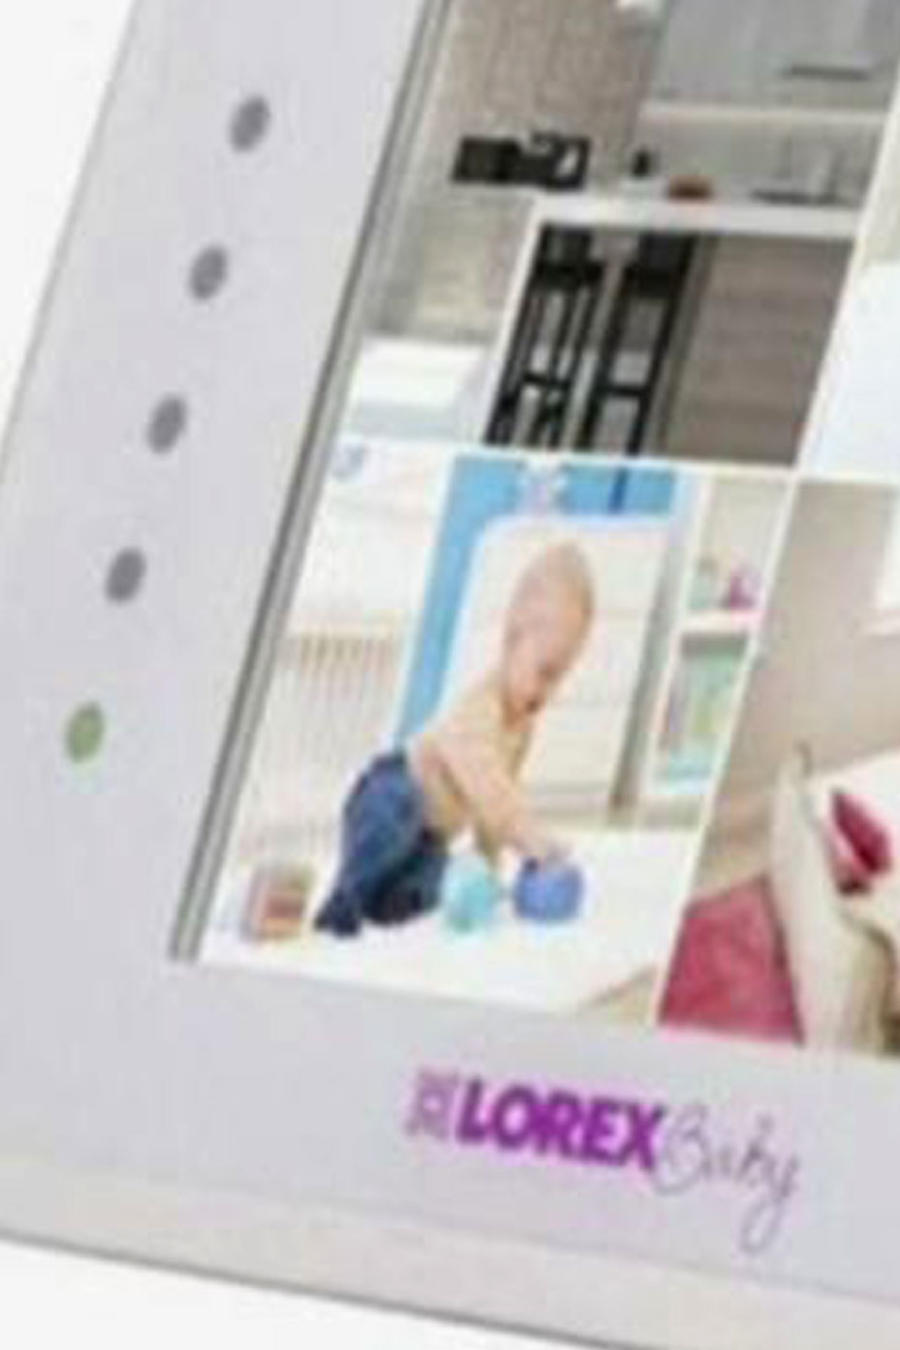 Retiran monitores de bebés por temor a incendios